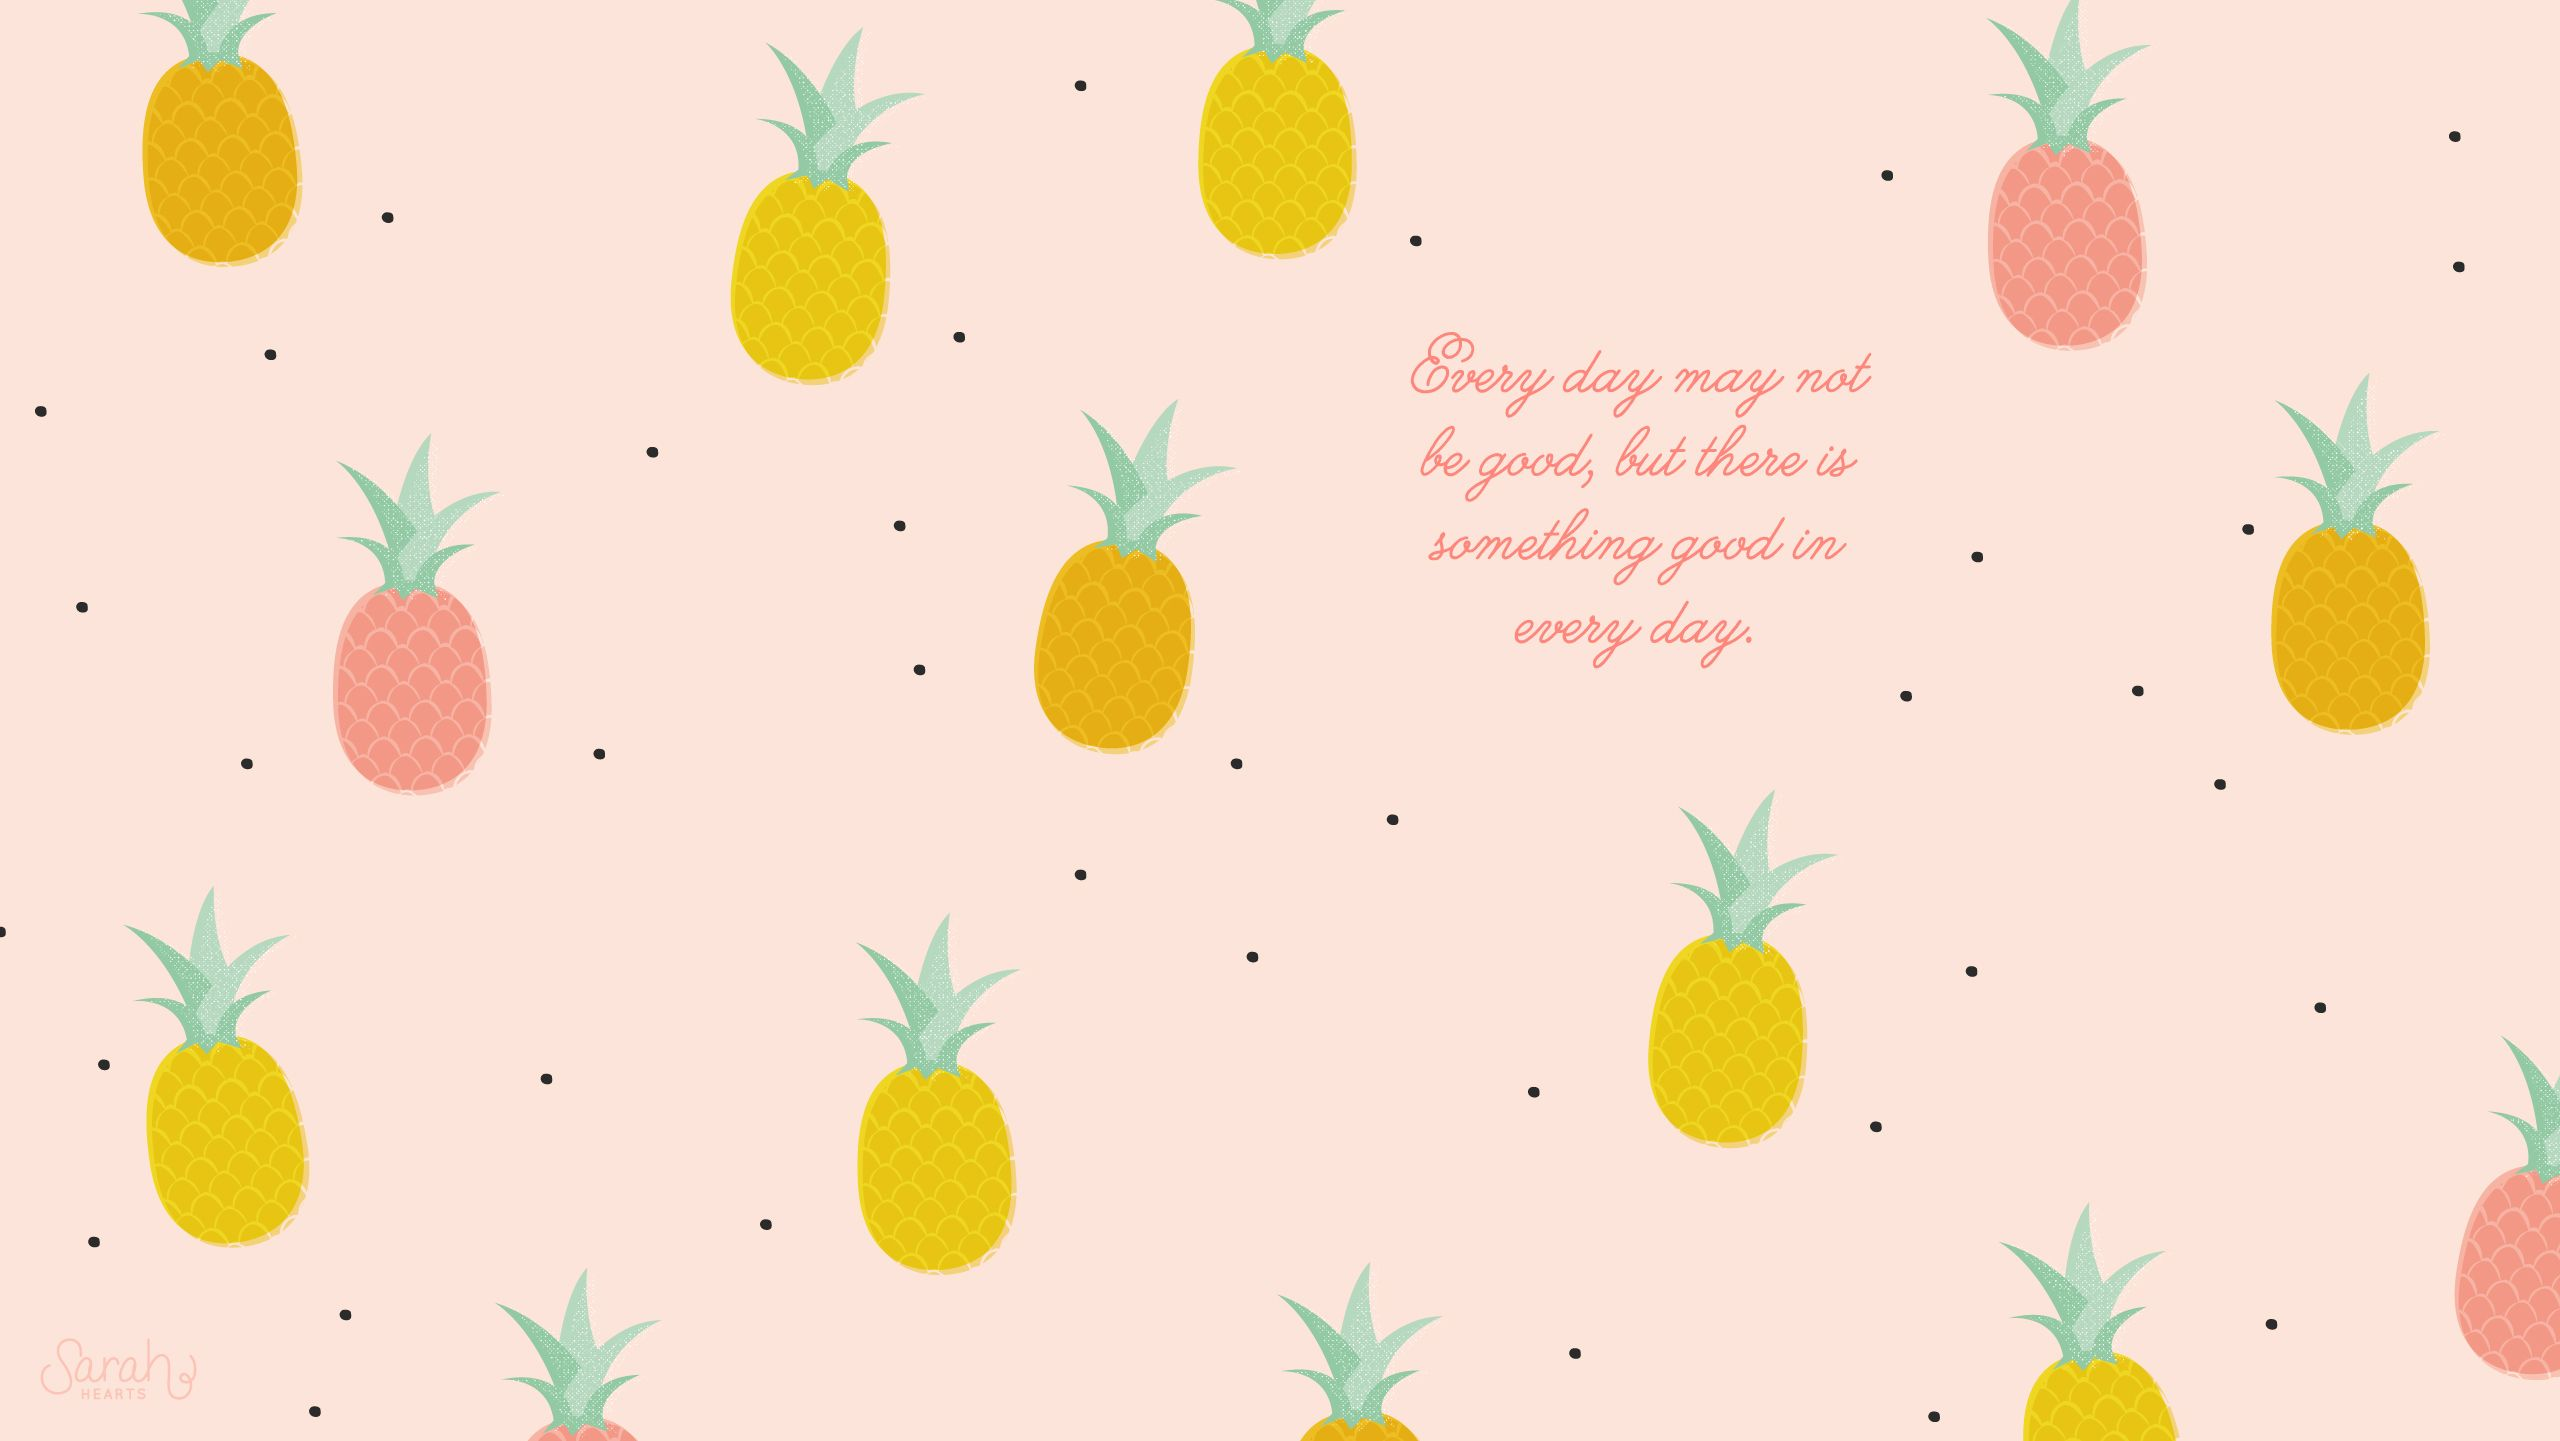 Good Wallpaper Home Screen Pineapple - ece7b5dec5c3d883a8075df1c53e828c  Trends_549399.jpg